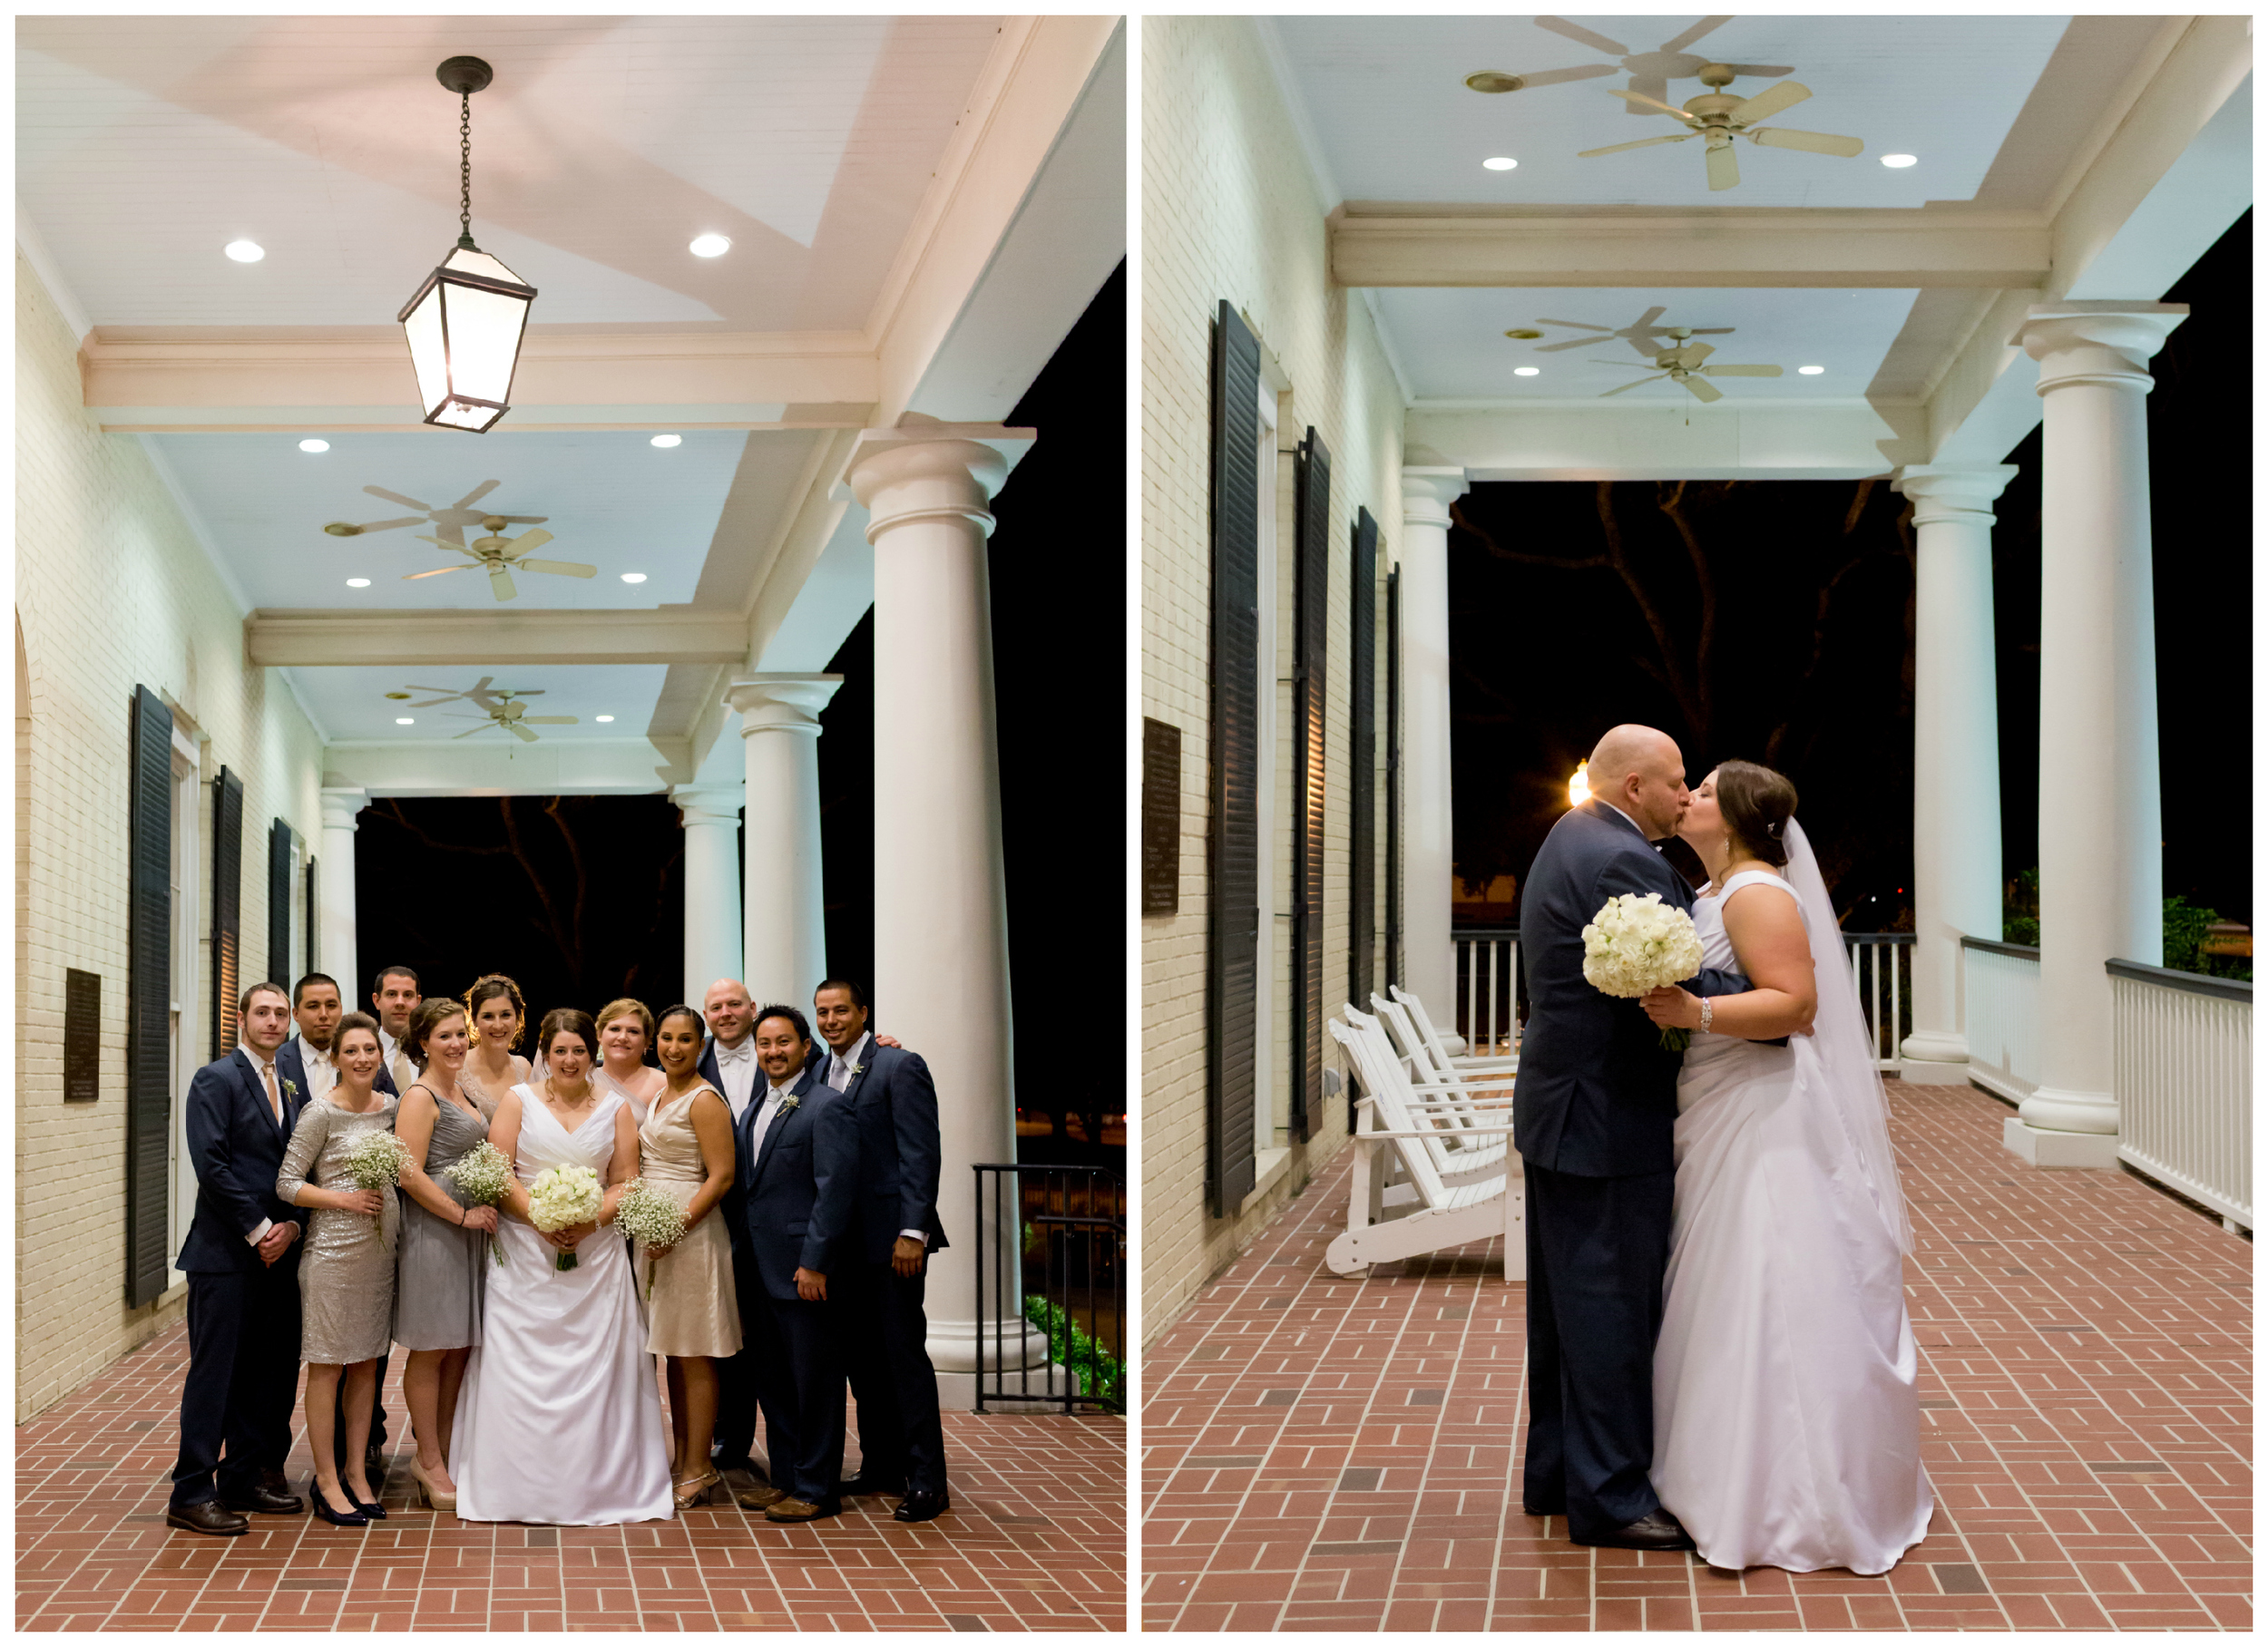 wedding party photos on porch at Biloxi Visitors Center